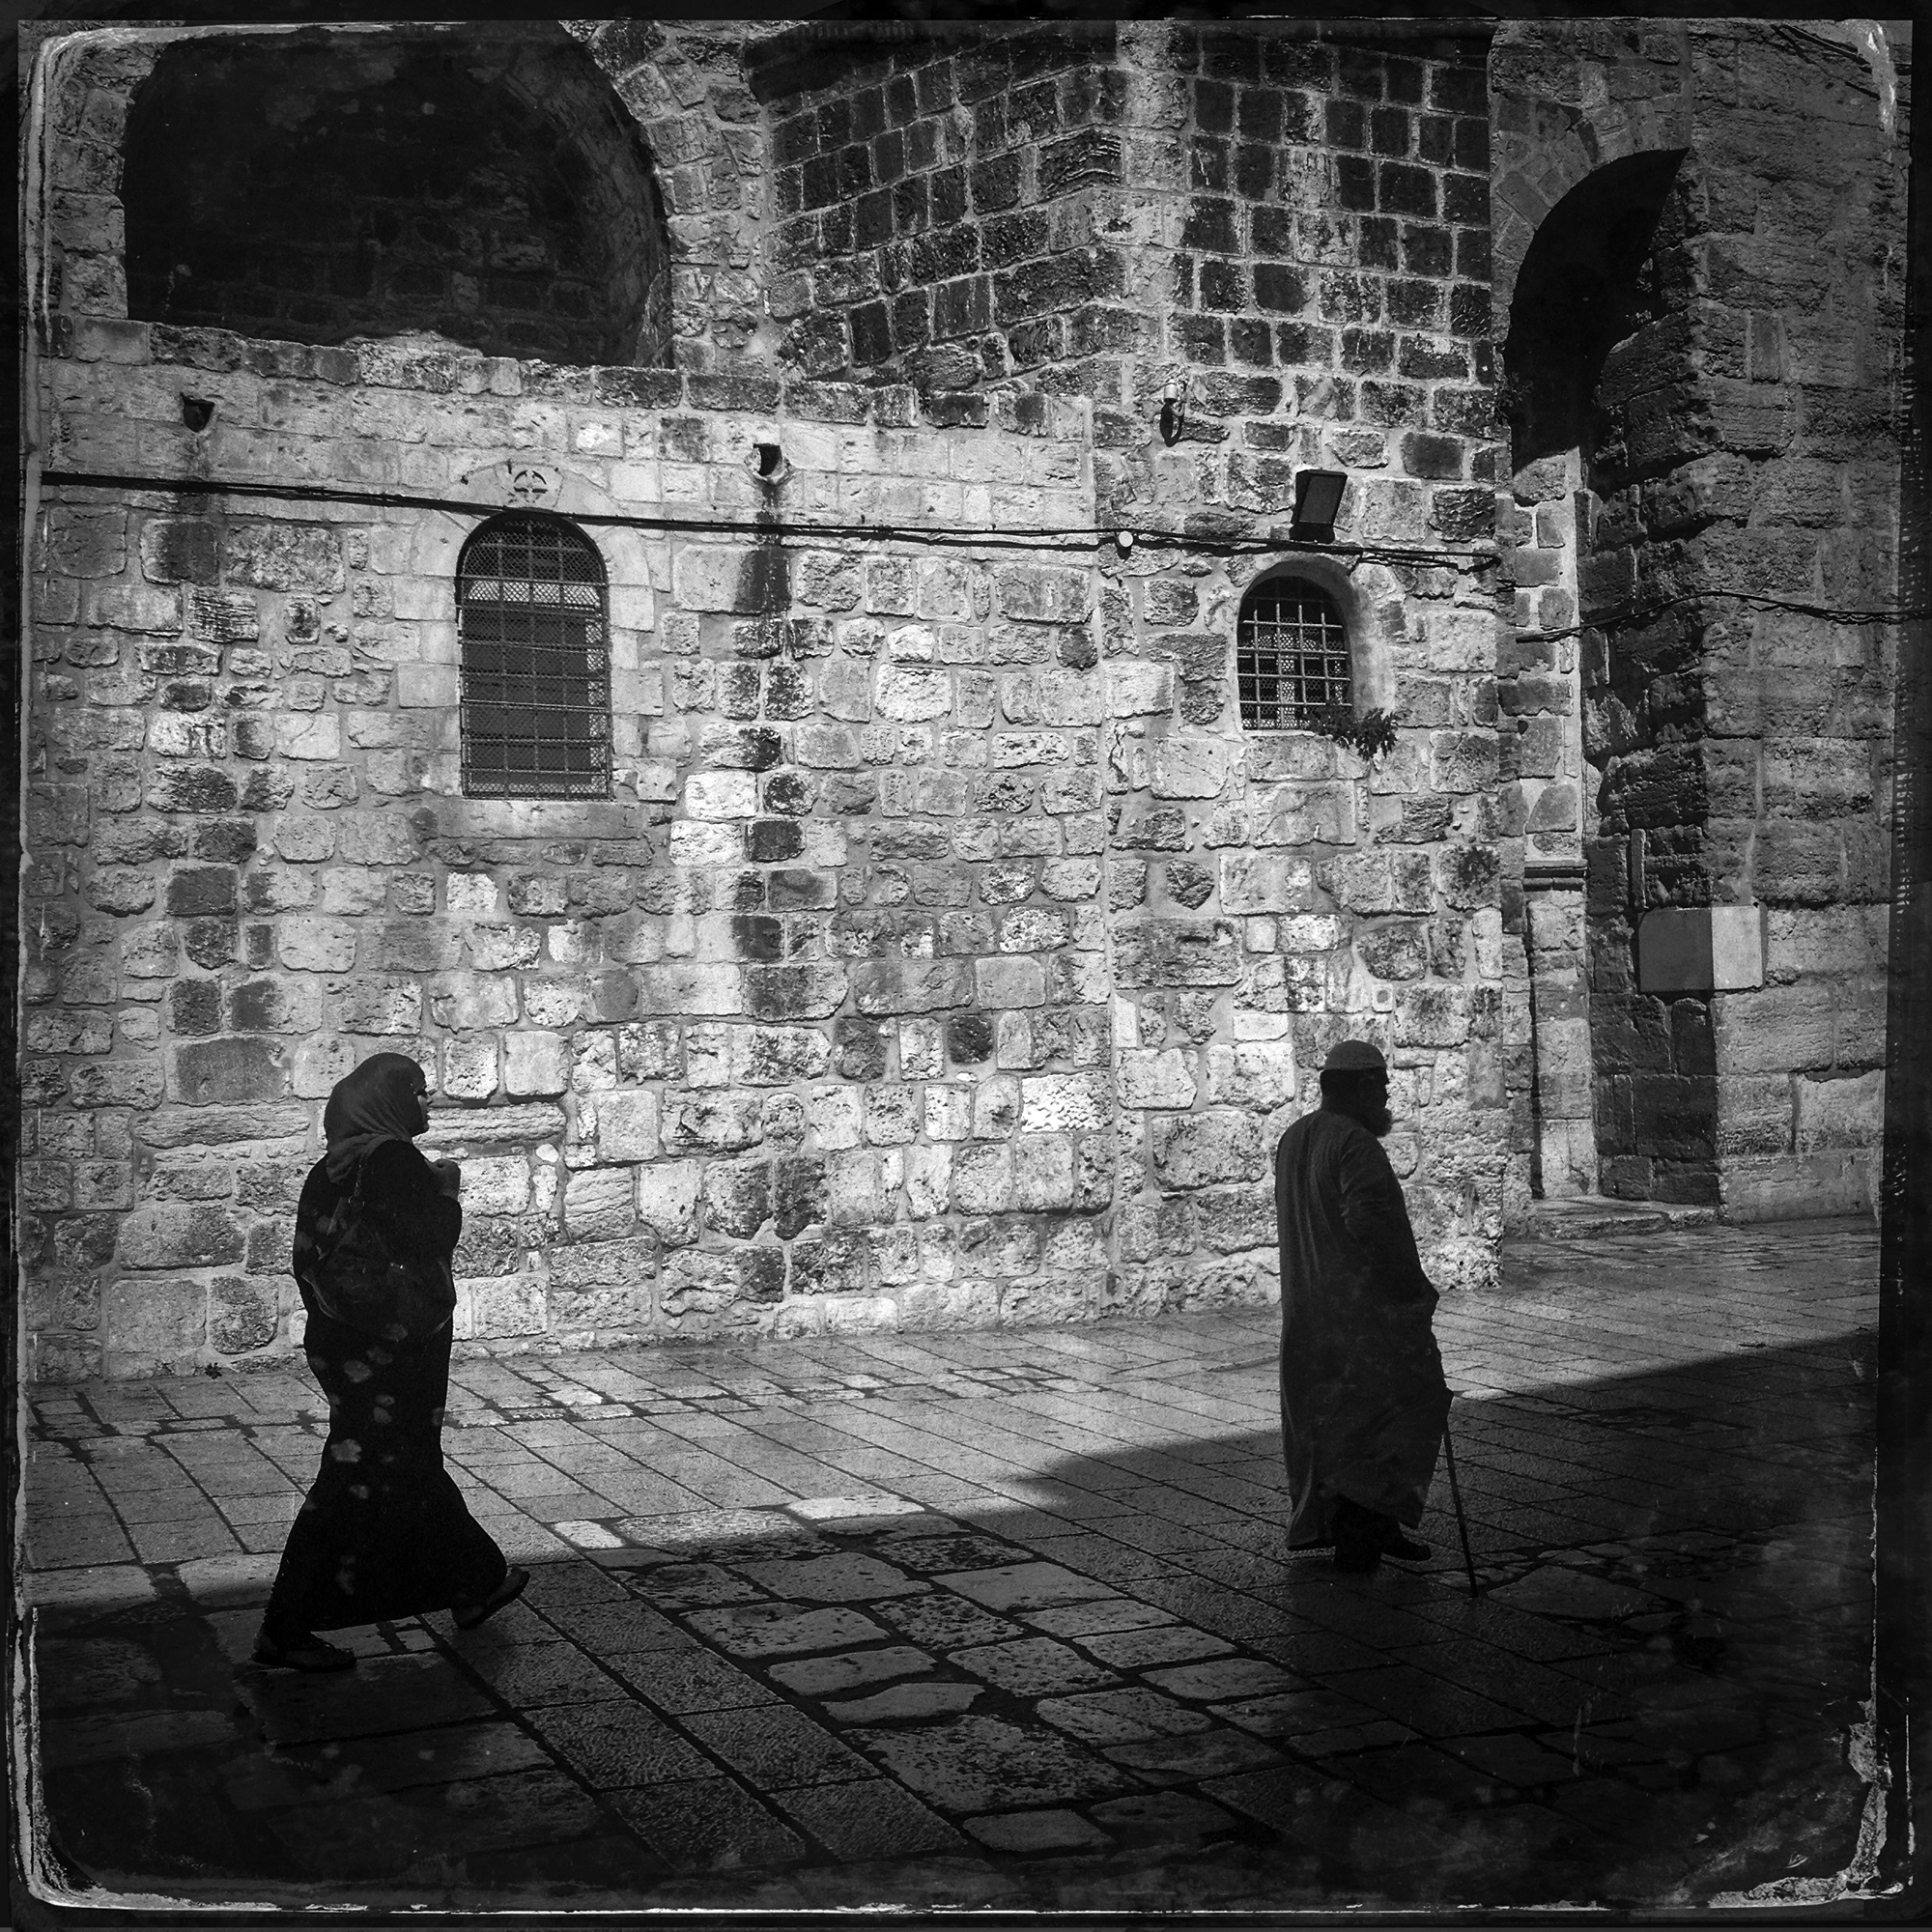 Church of the Holy Sepulchre, Jerusalem, 2013